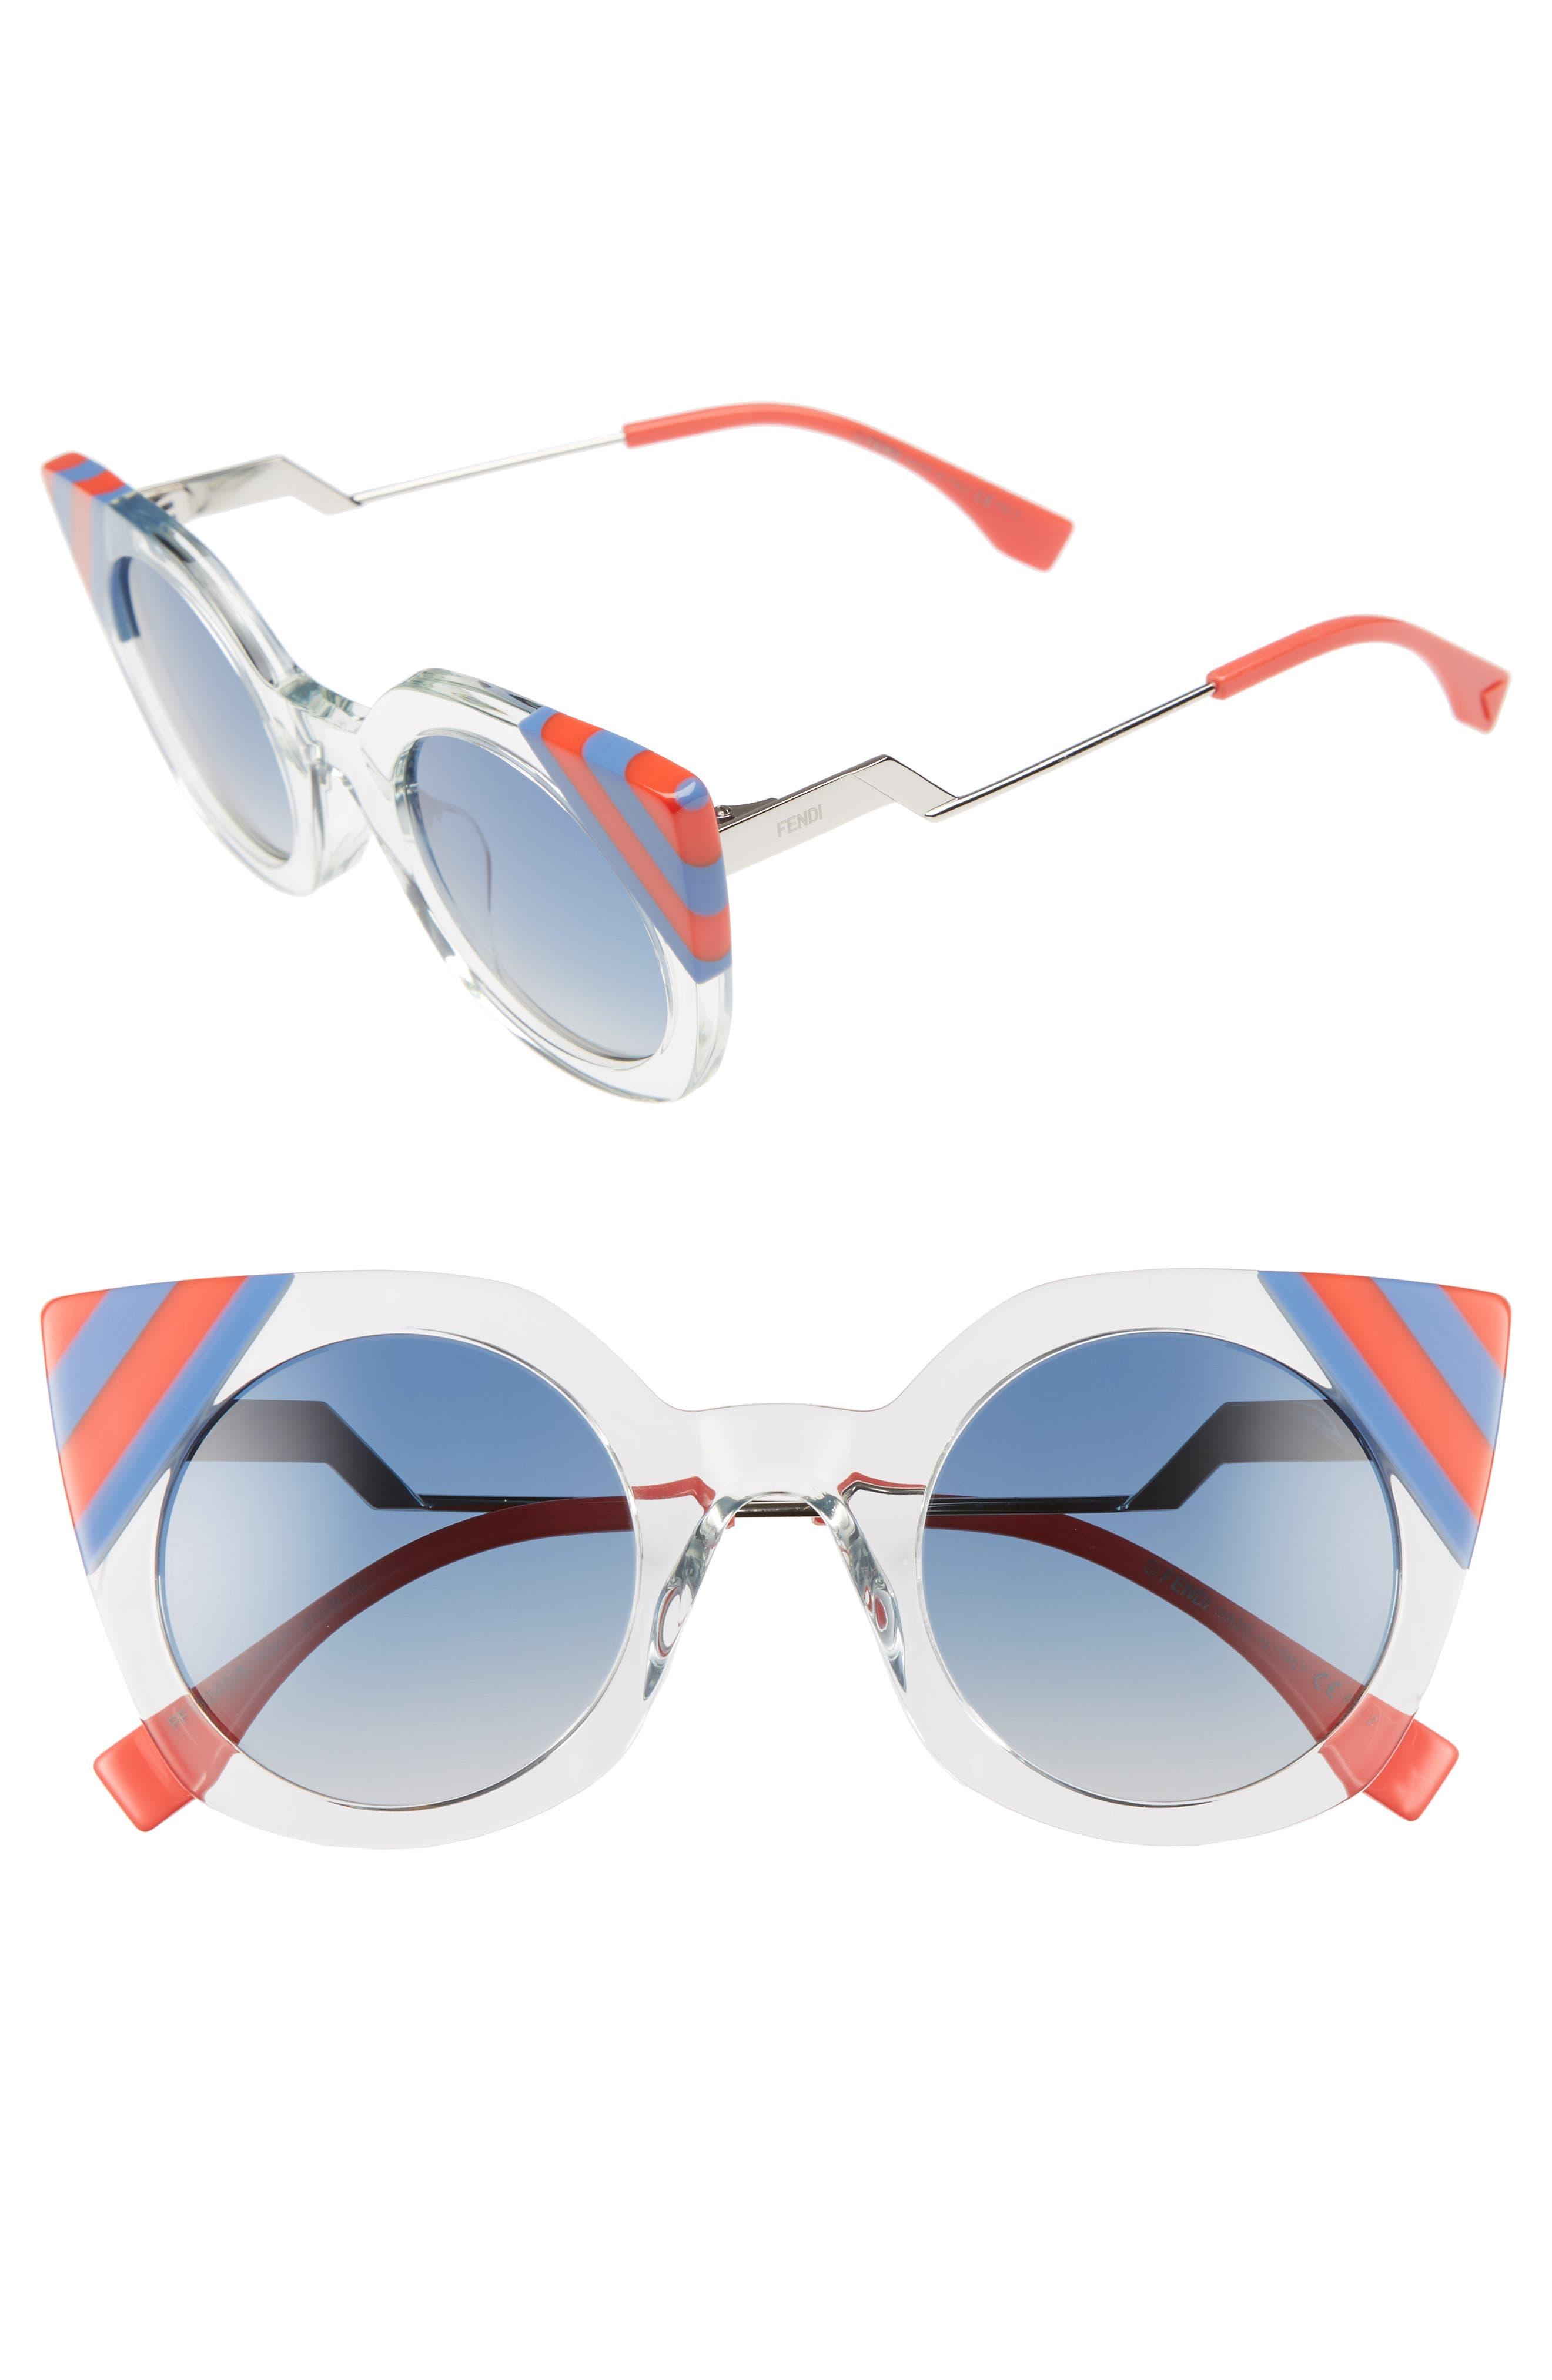 47mm Cat Eye Sunglasses,                             Main thumbnail 1, color,